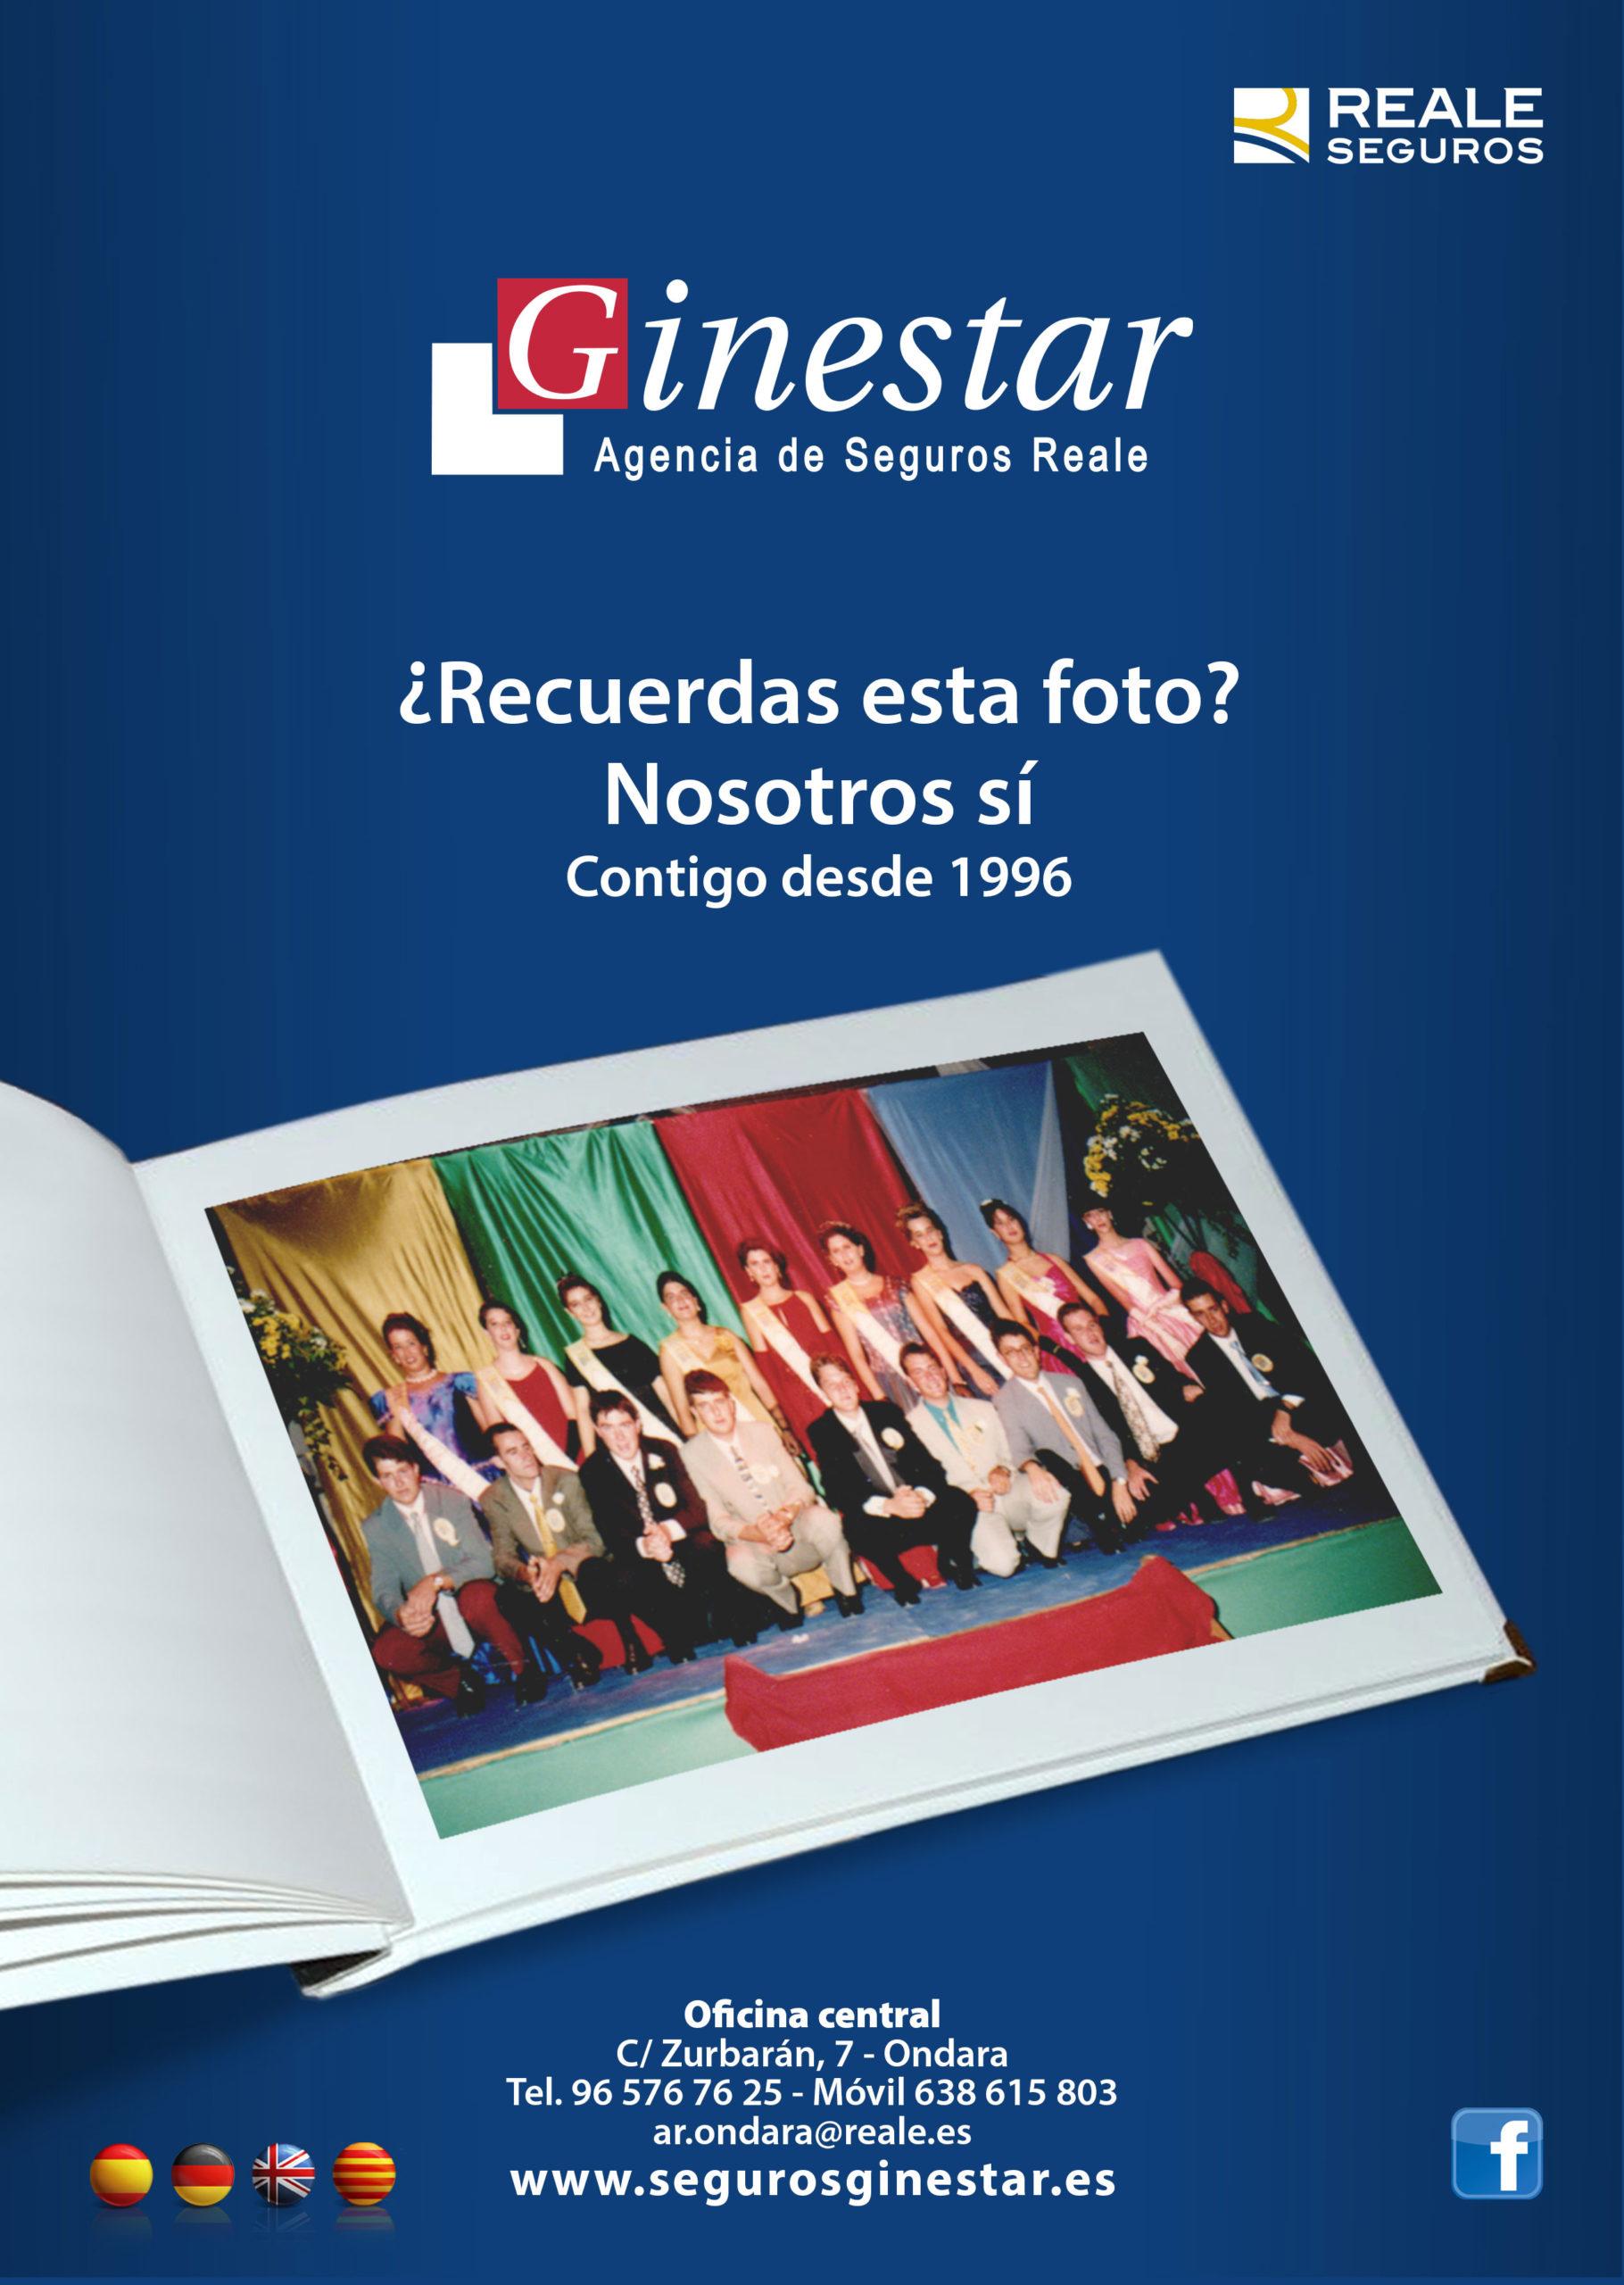 publi-ginestar-2017-generica-fiestas